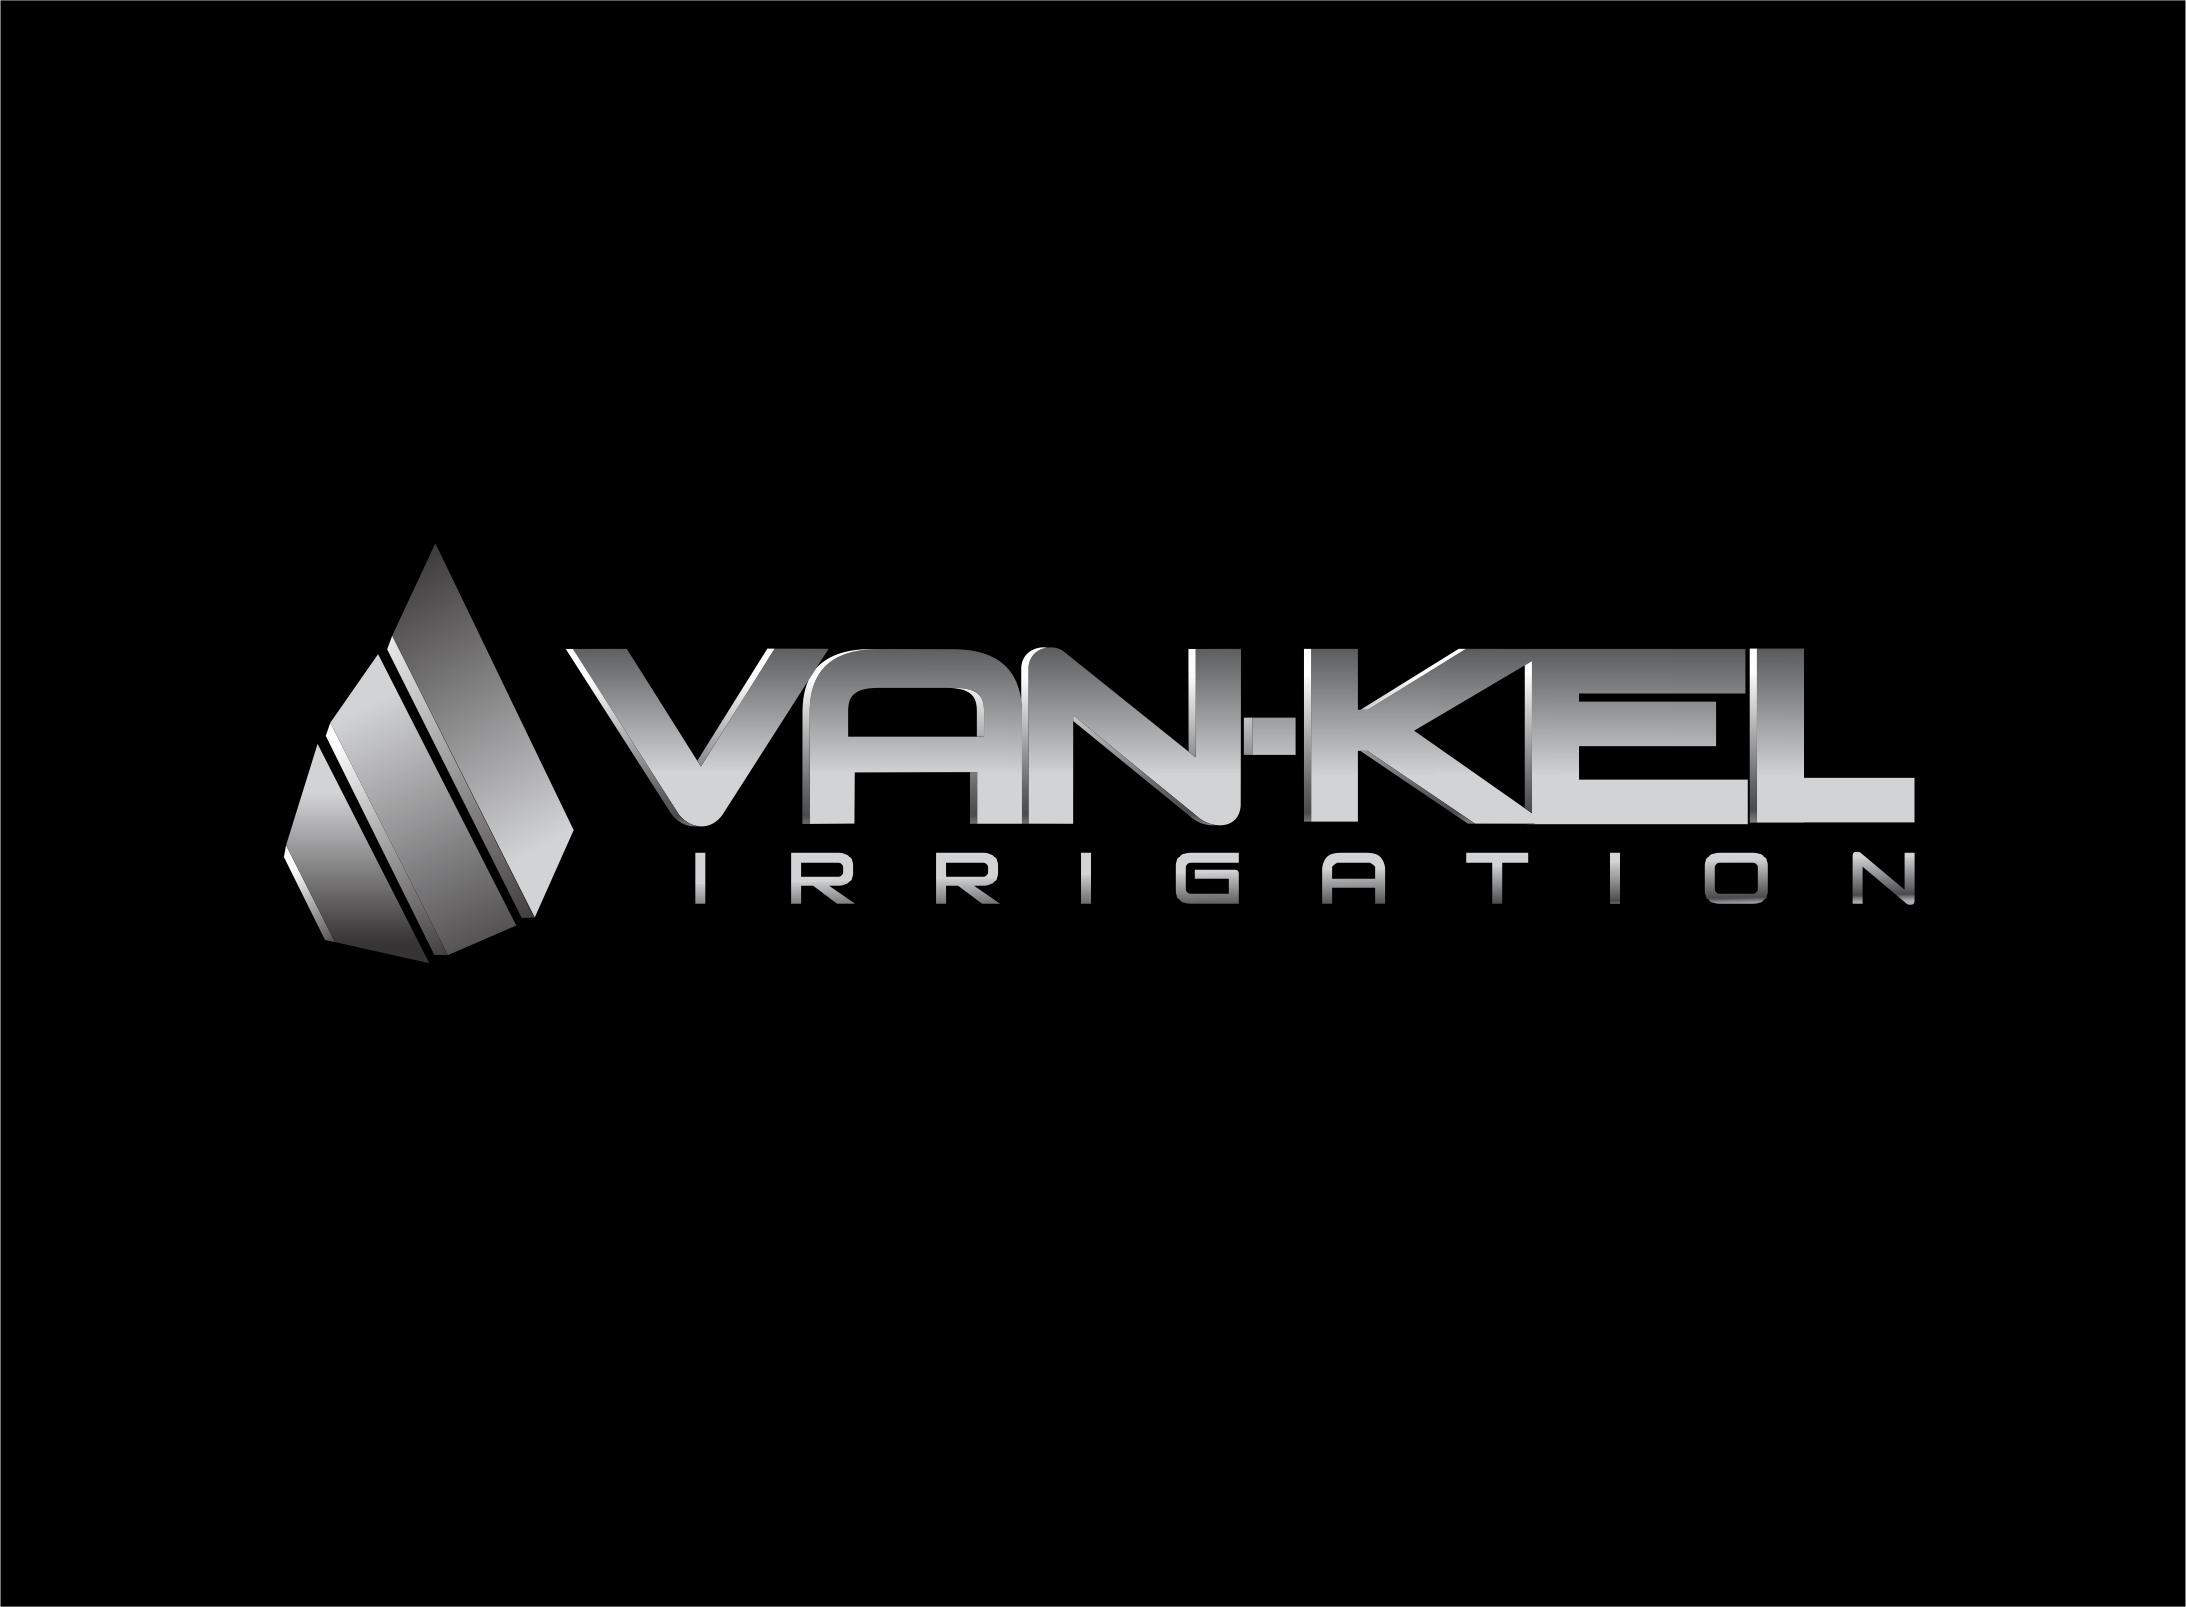 Logo Design by Zdravko Krulj - Entry No. 96 in the Logo Design Contest Van-Kel Irrigation Logo Design.